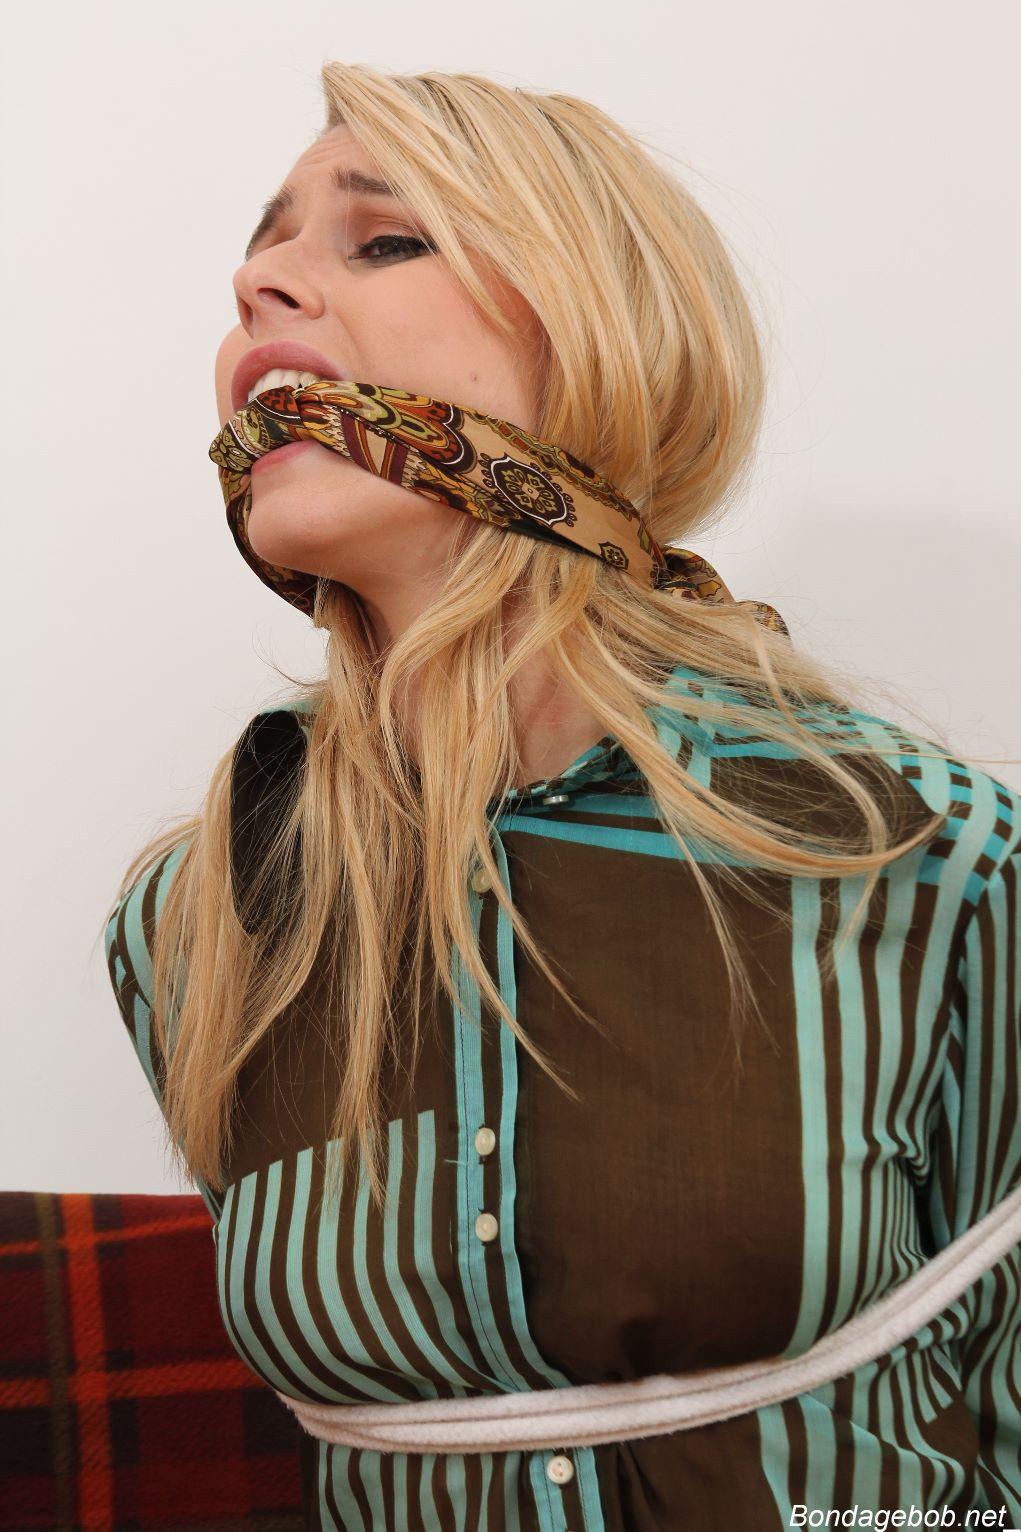 Chloe Toy in bondage.